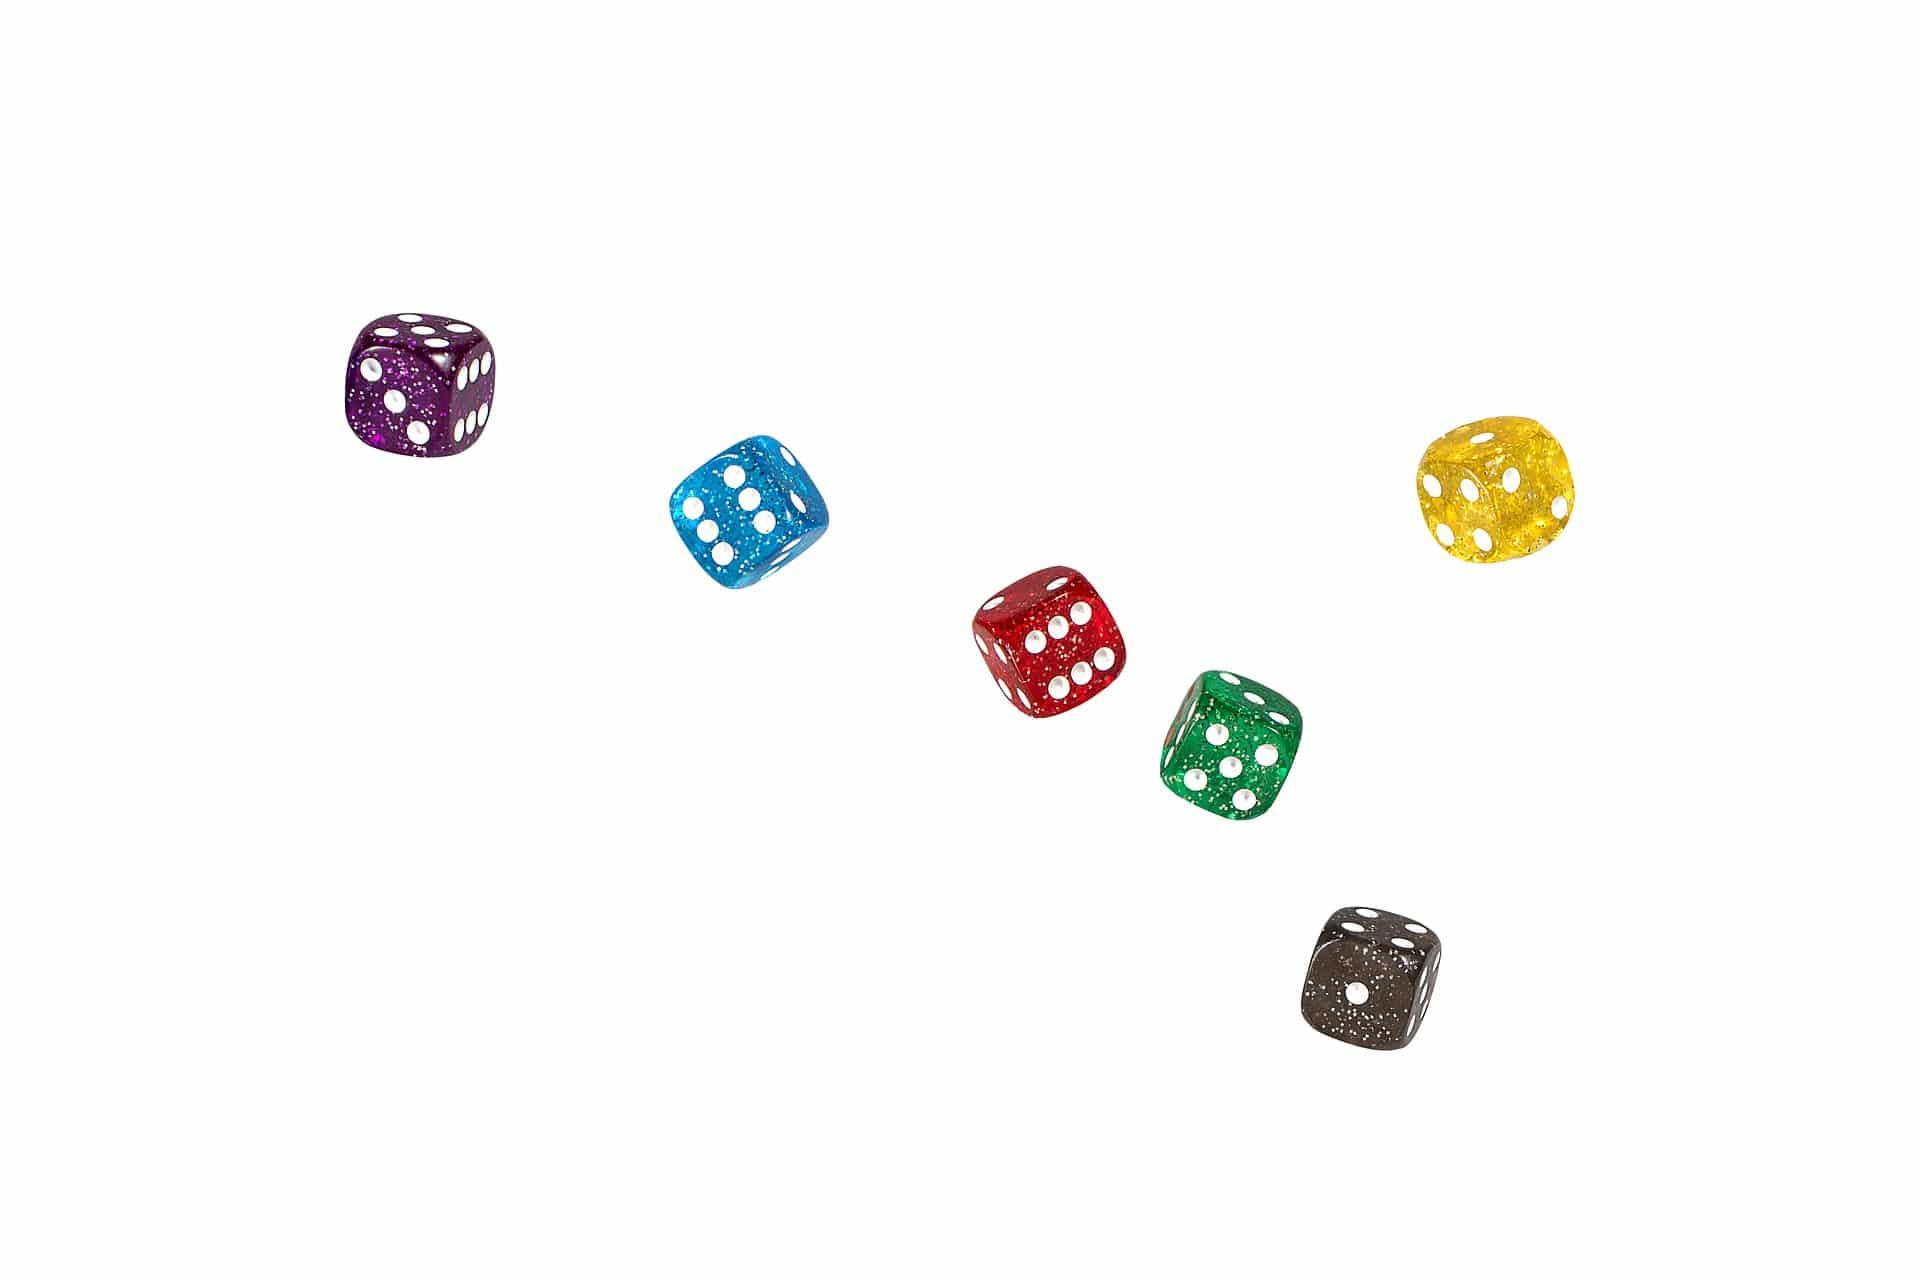 Cube-5113958 casino